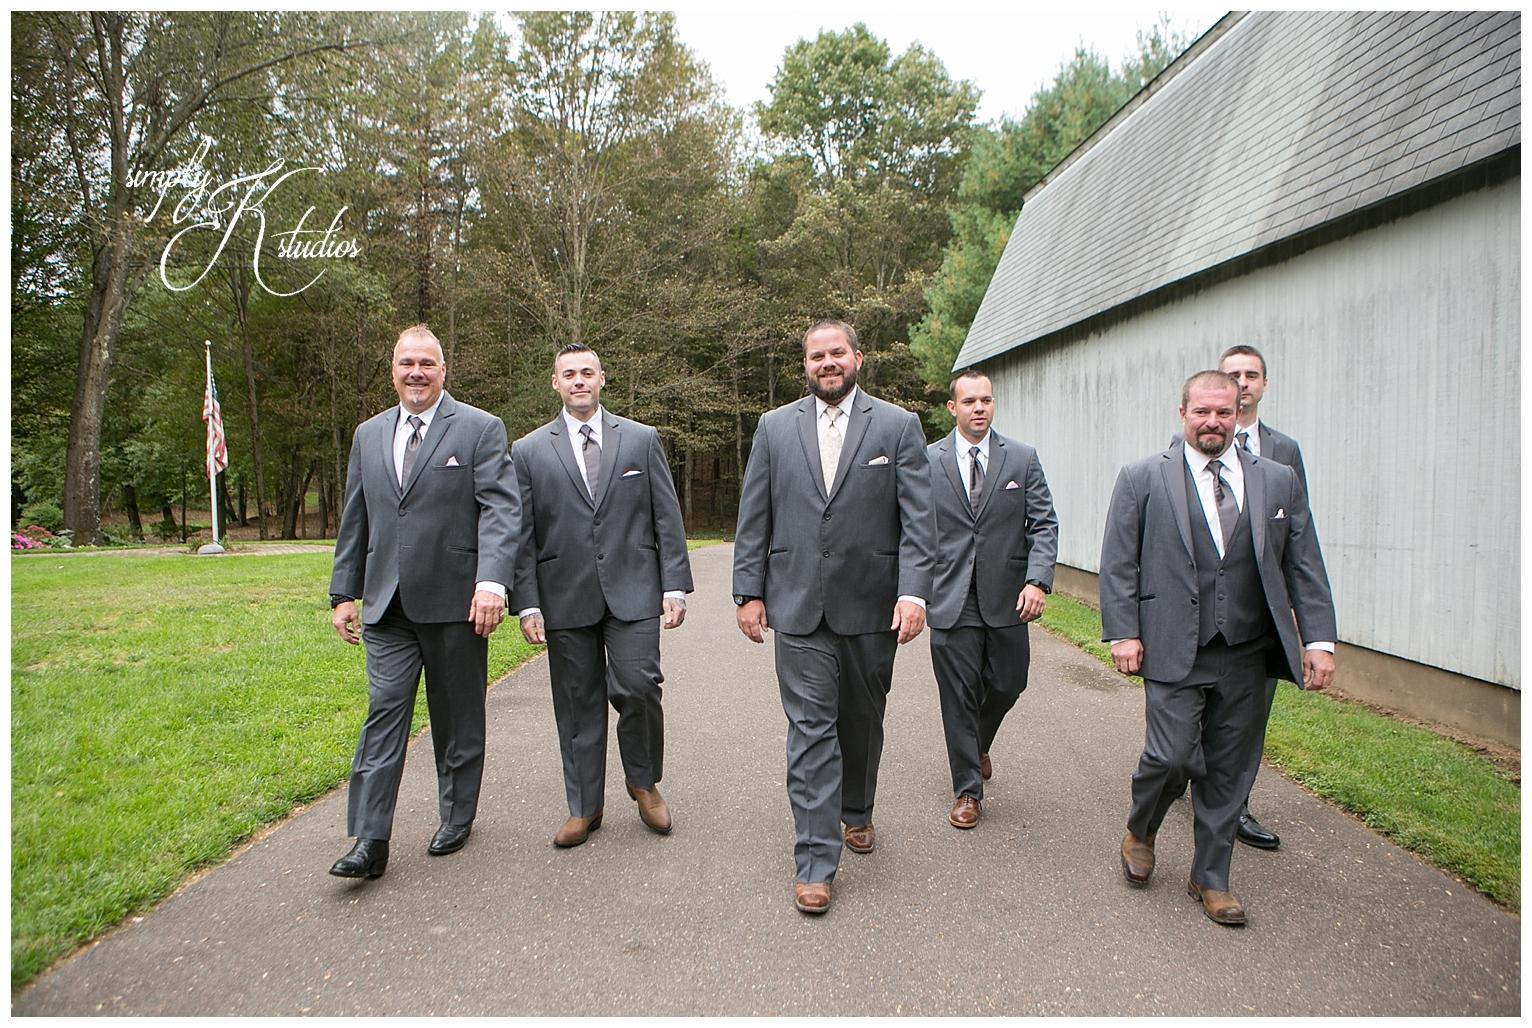 Wedding in Ellington CT.jpg